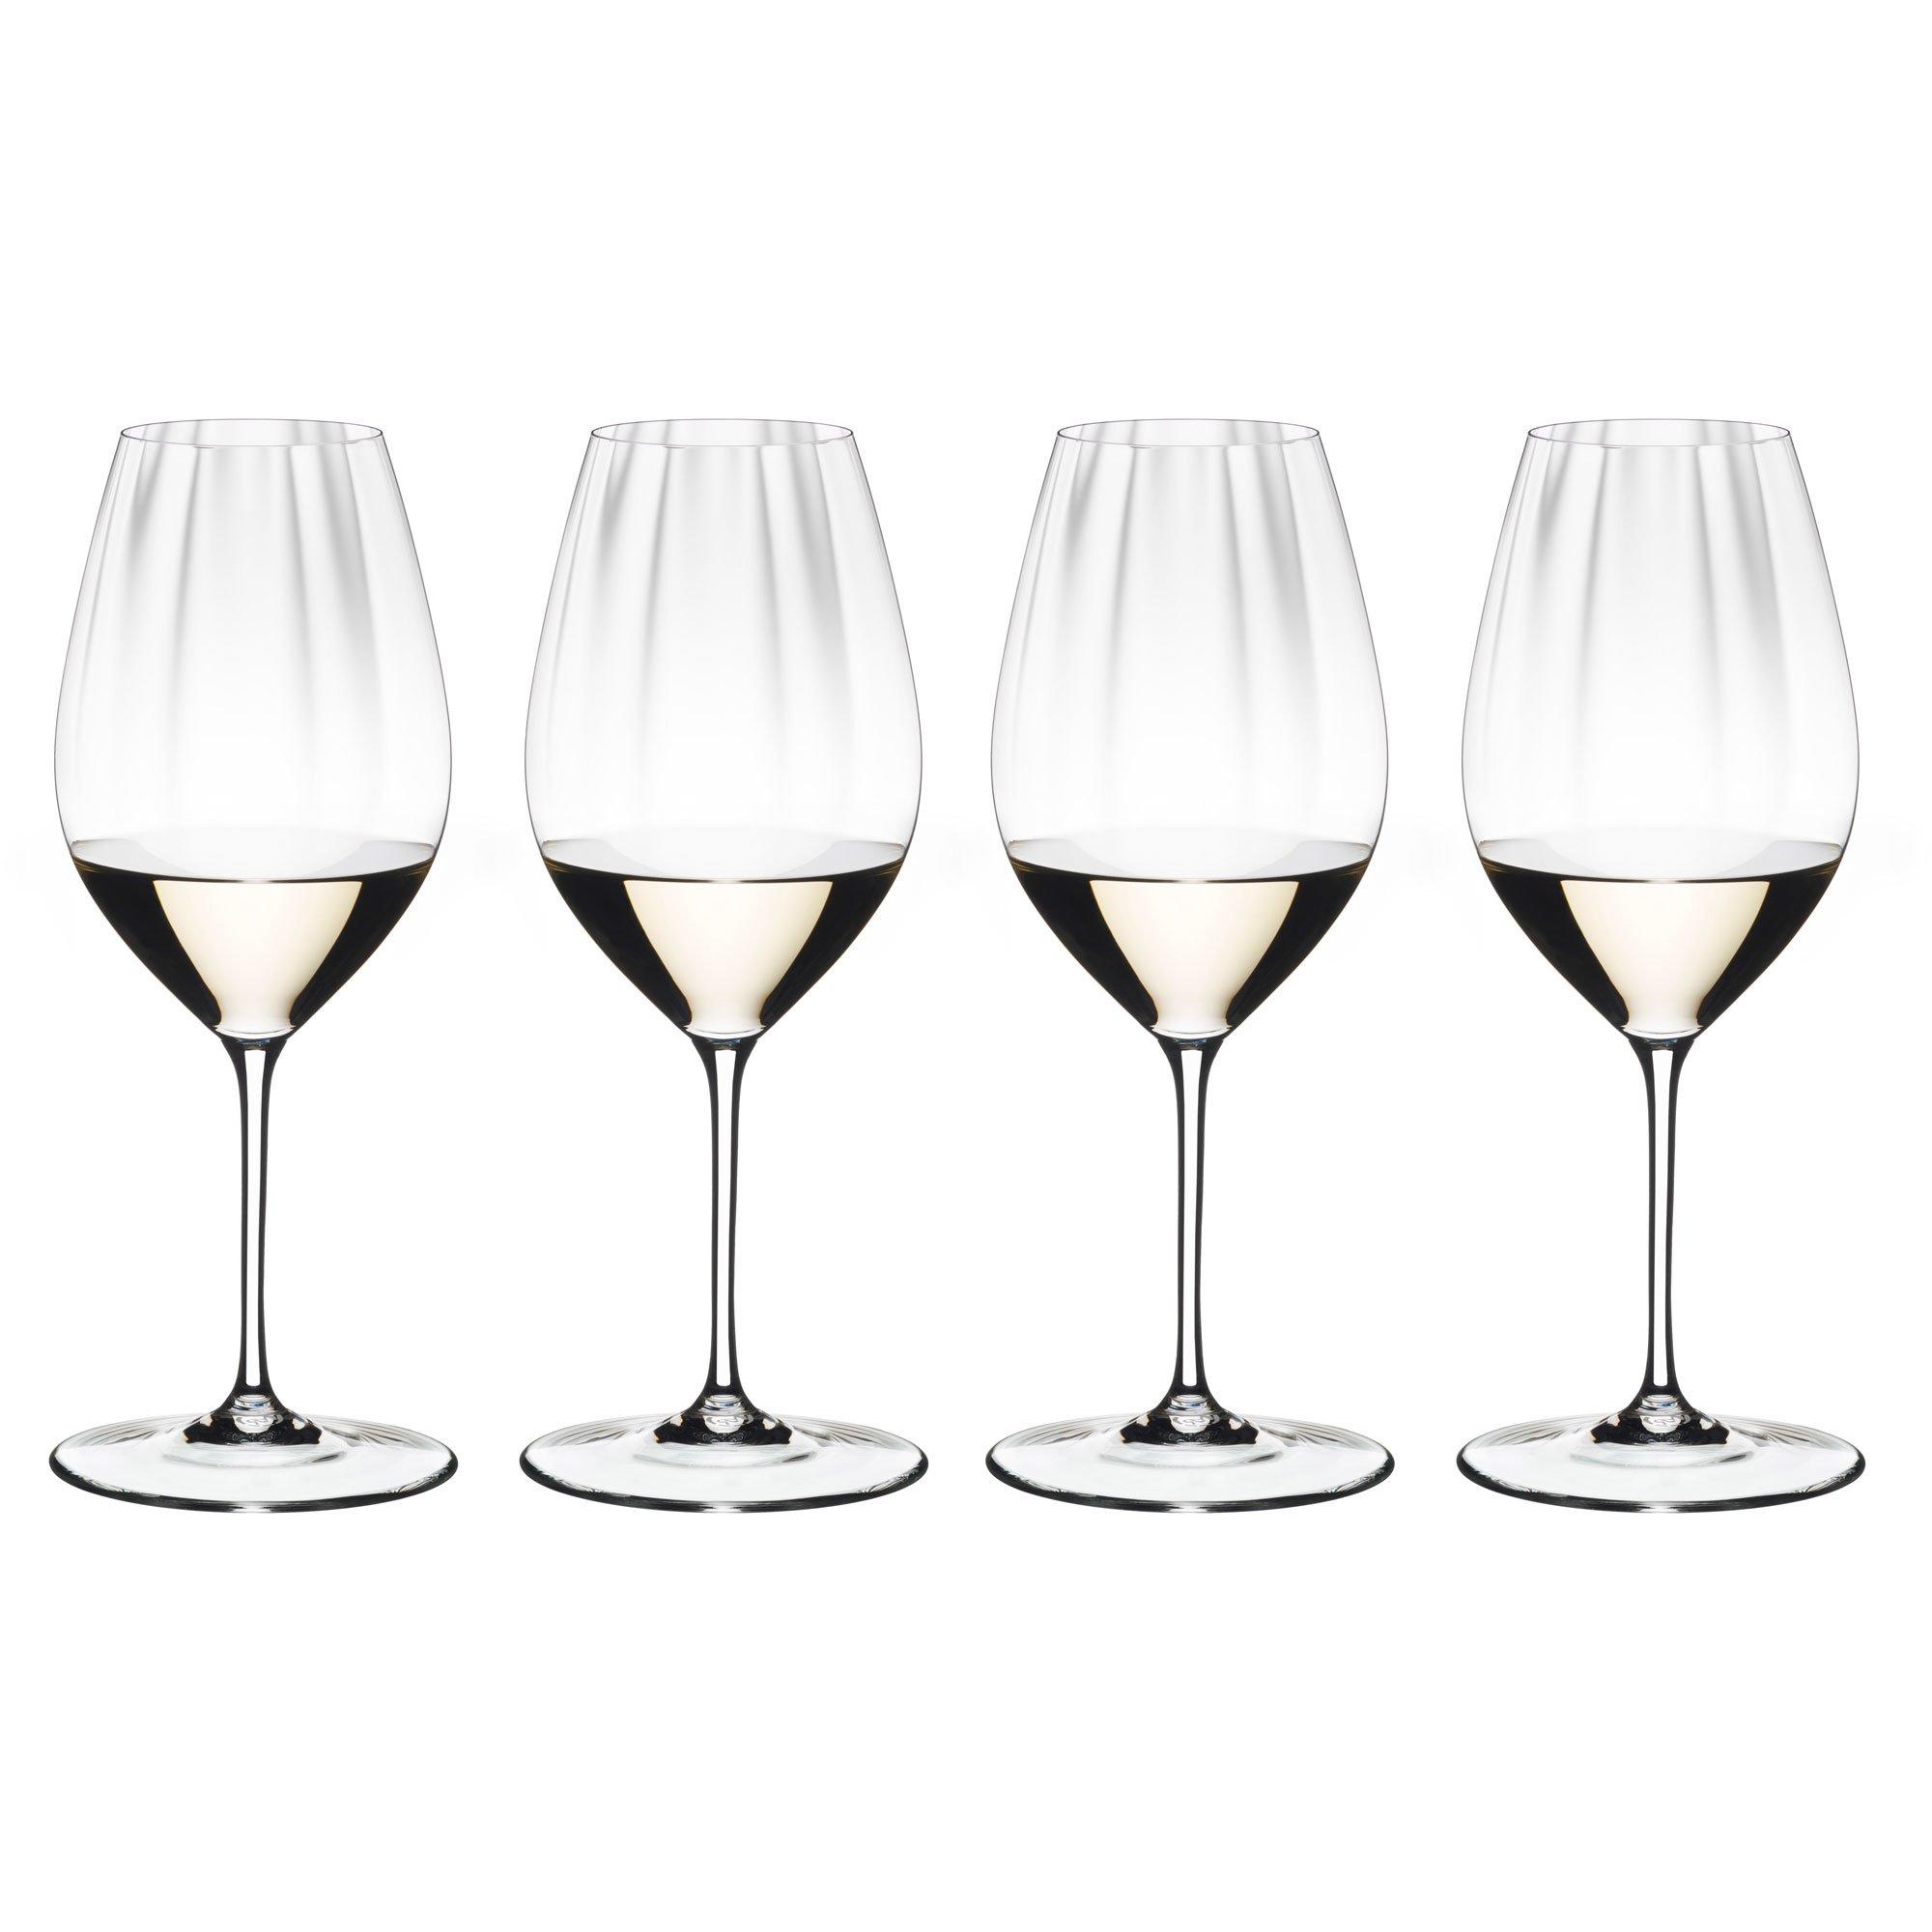 Riedel Preformance vitvinsglas till Riesling 4 st.